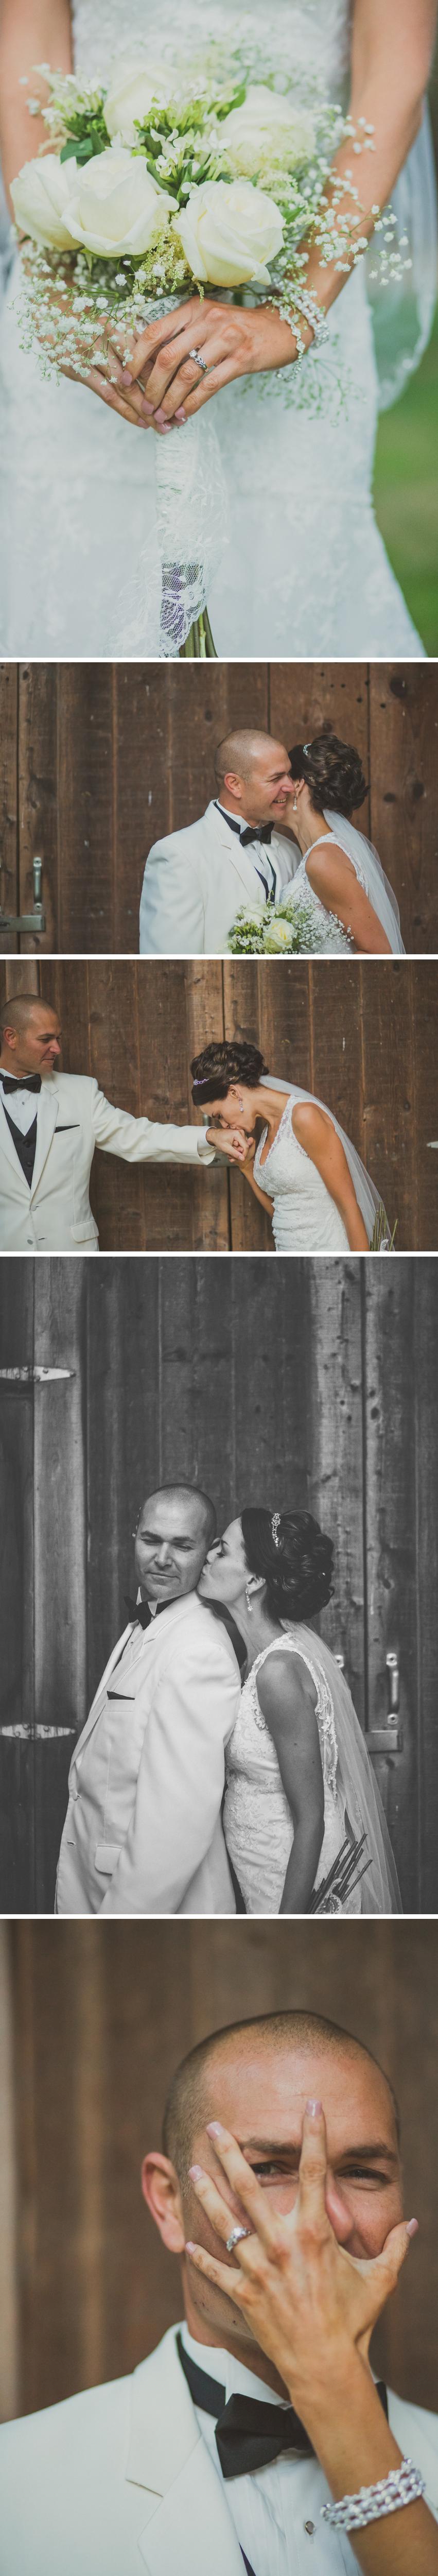 TCI-wedding11